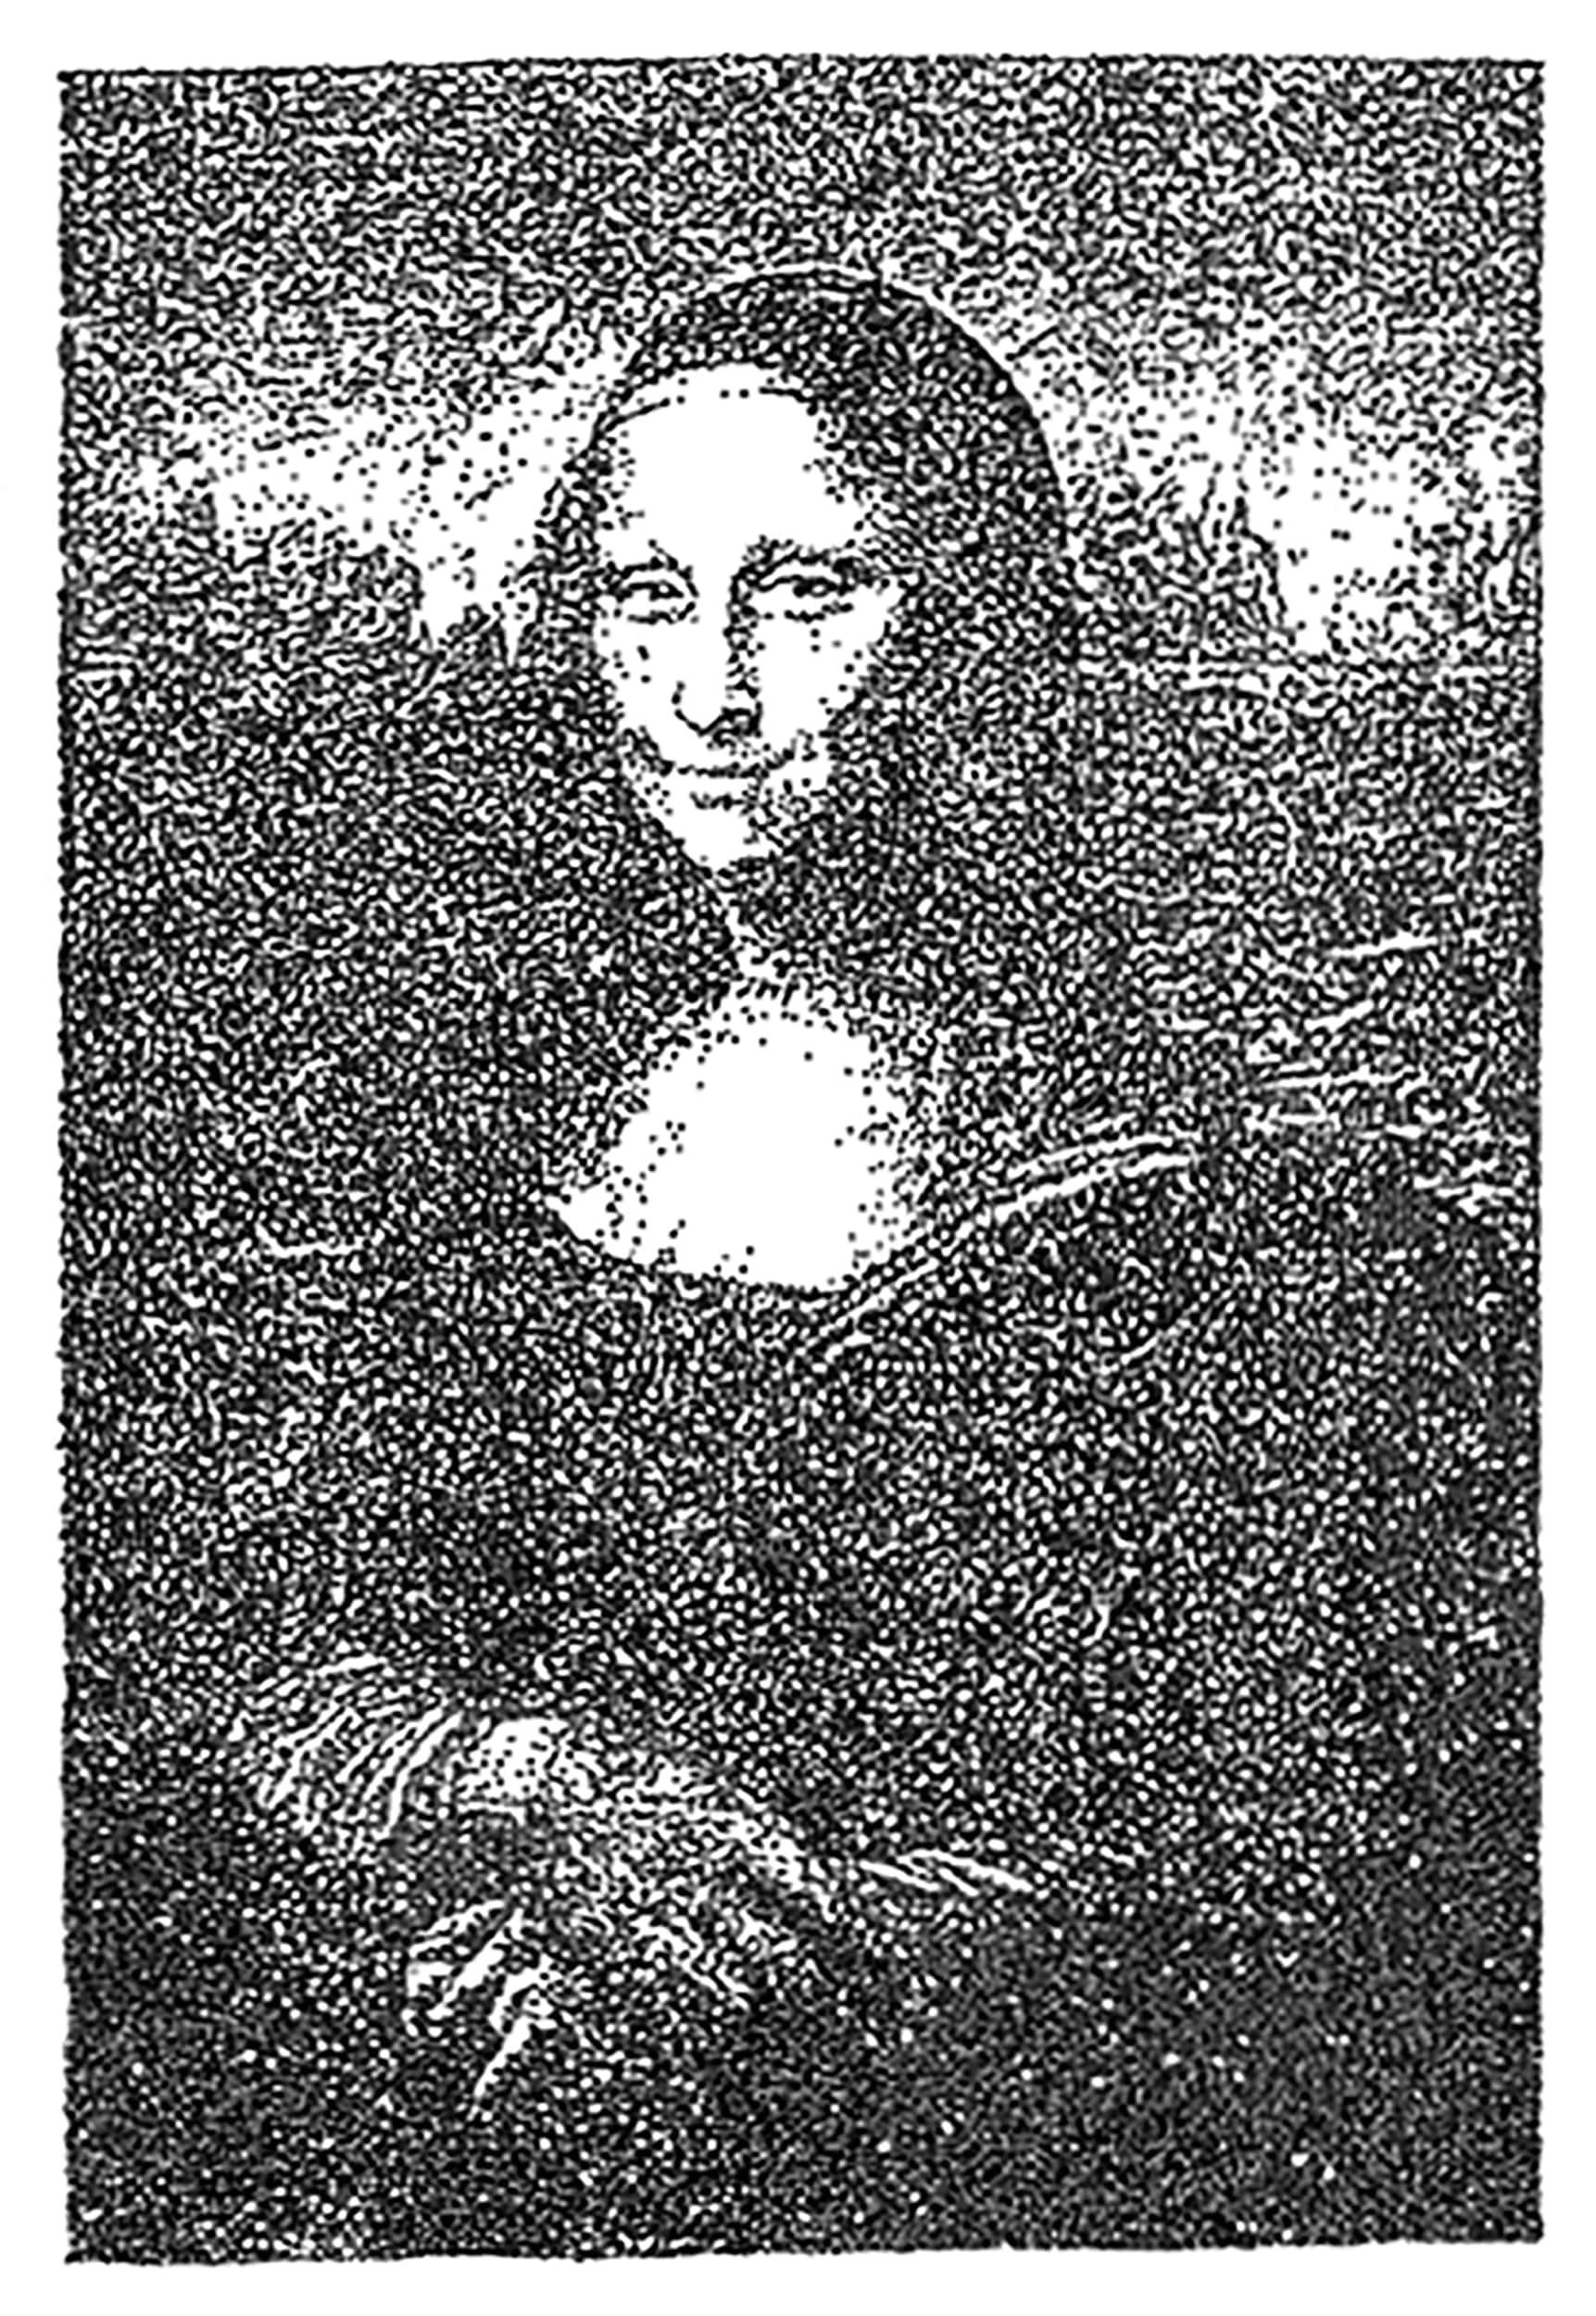 1000 drawings monalisa esteban peña art